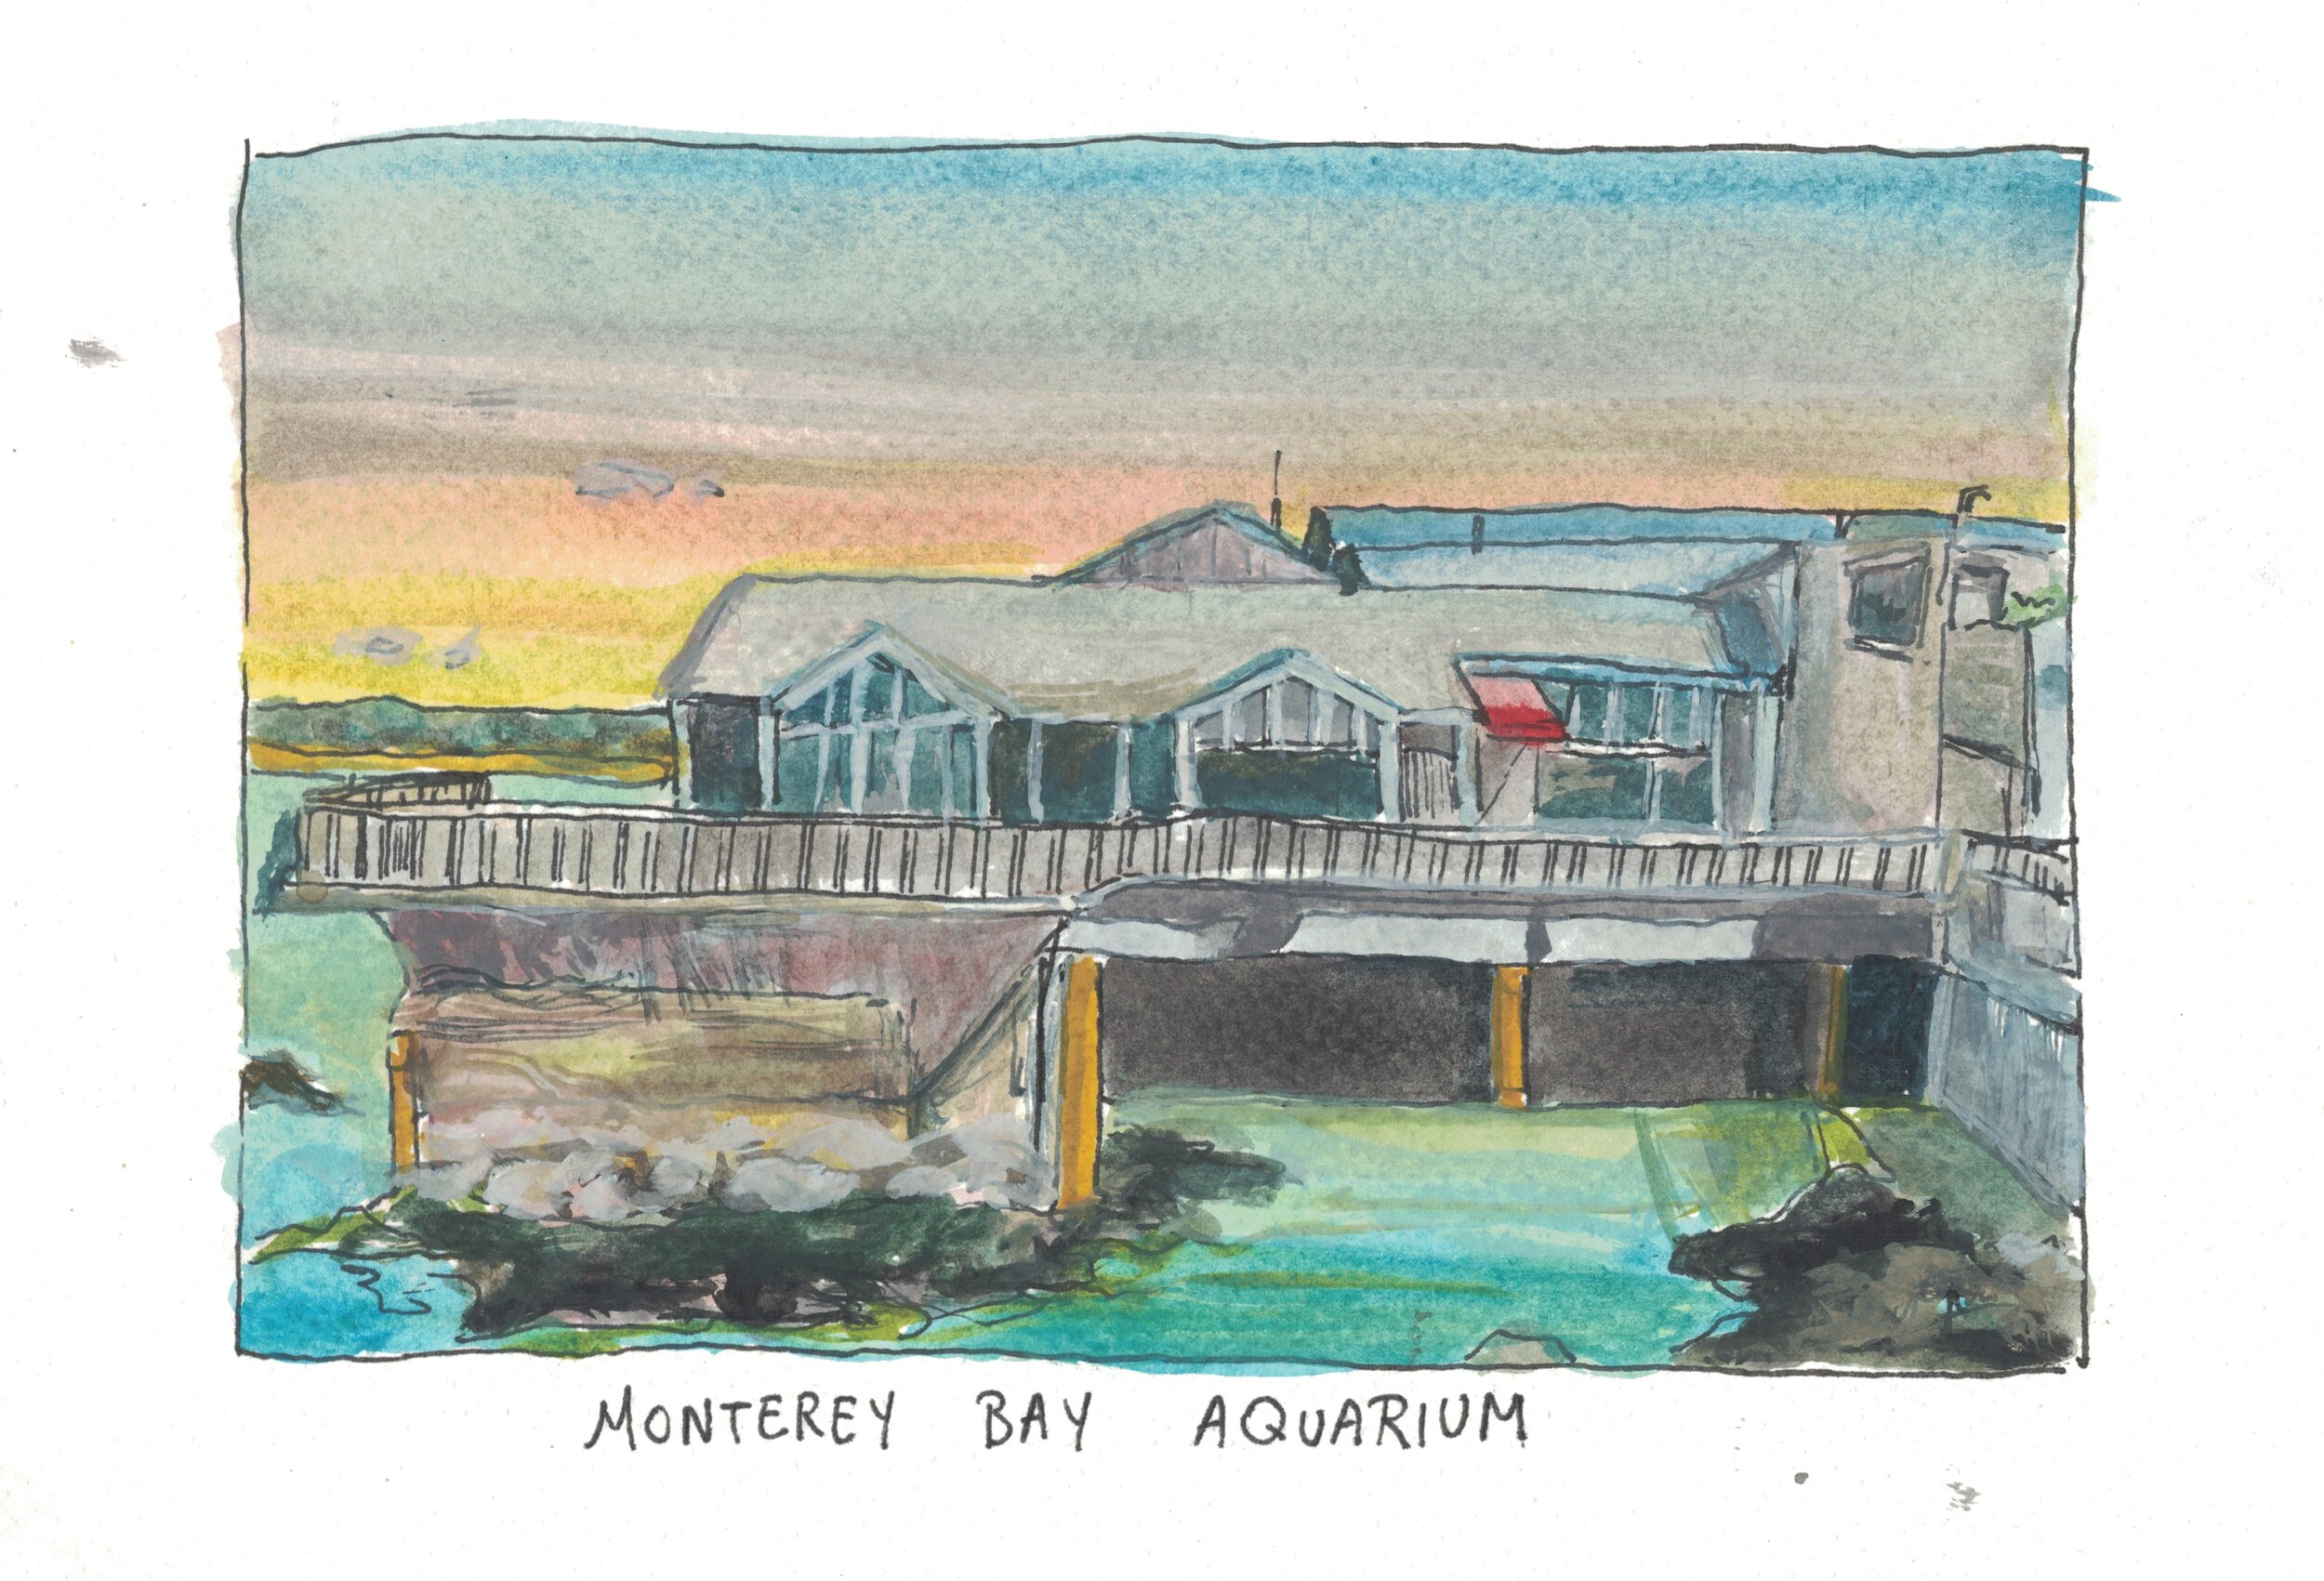 Monterey Bay Aquarium (Painted).jpeg